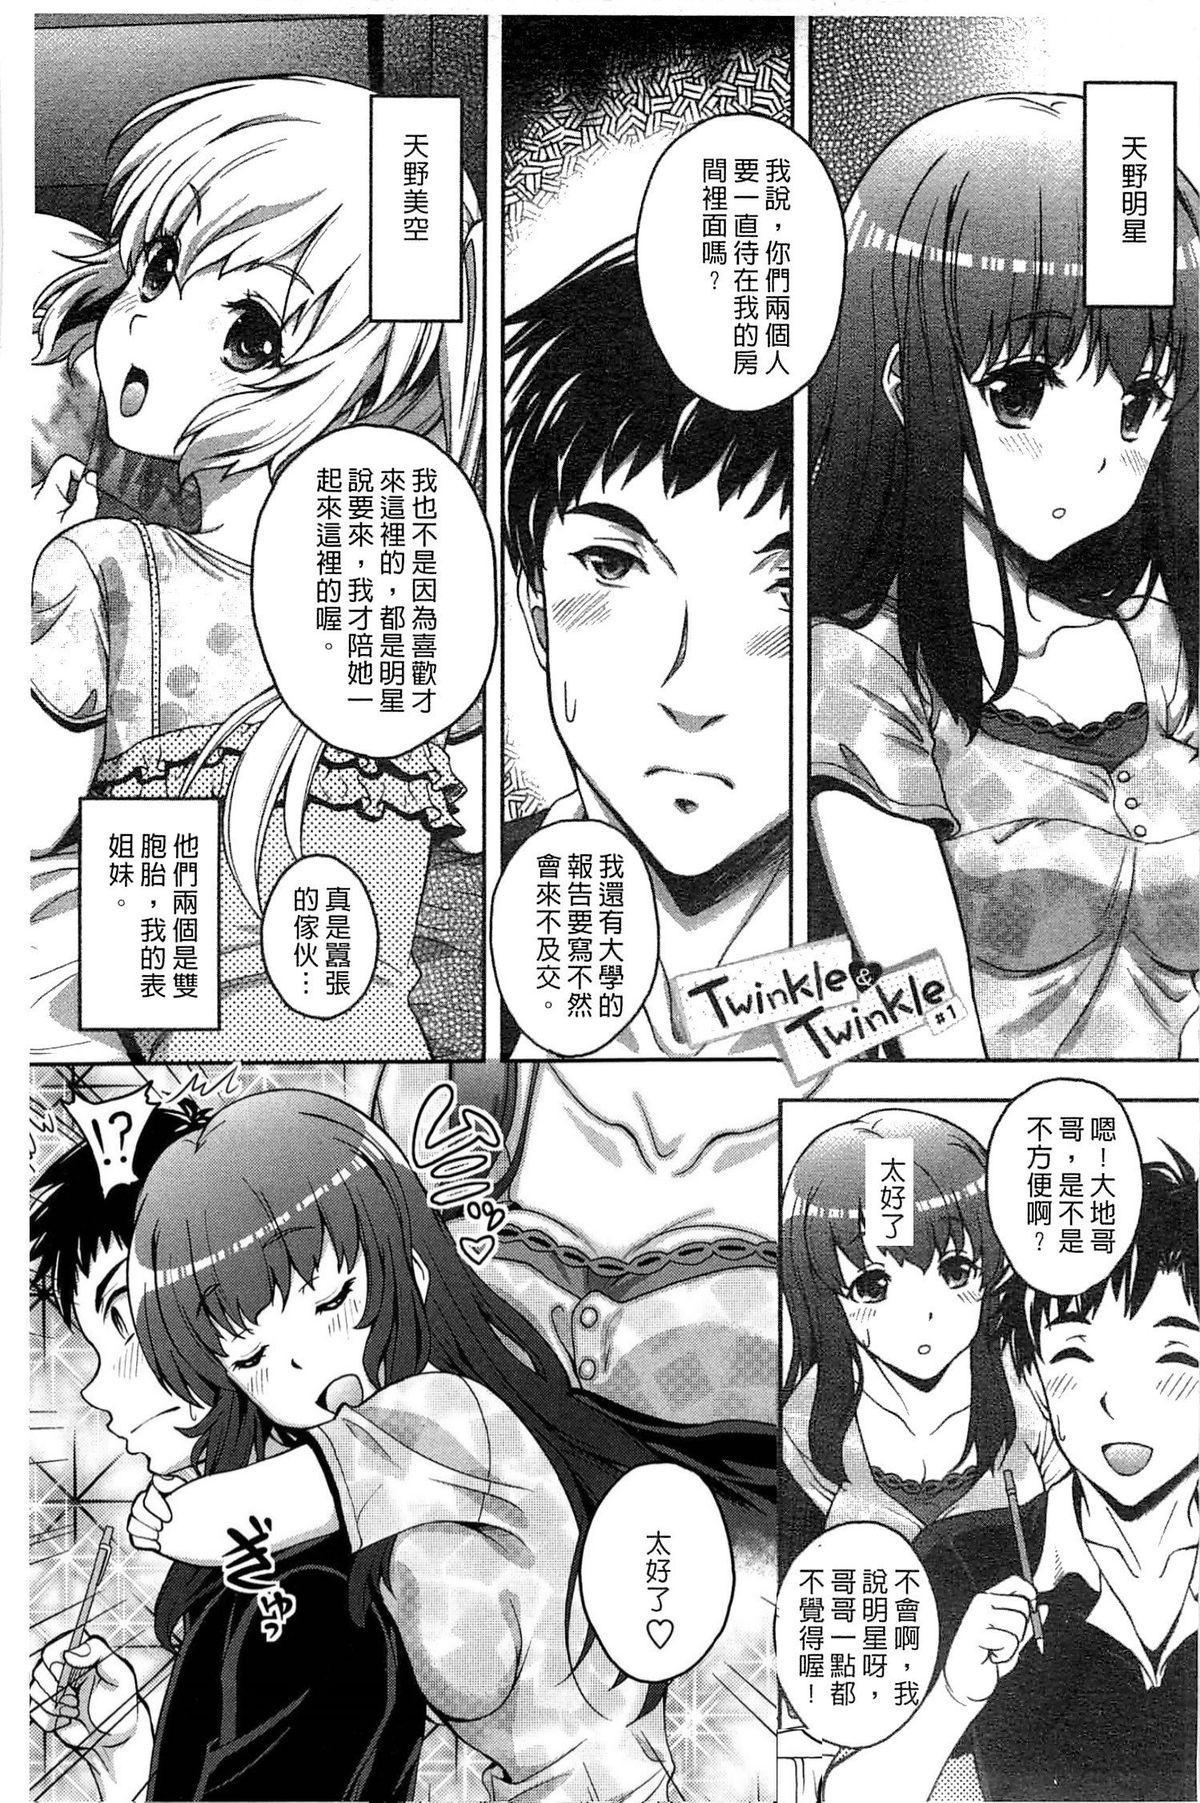 Hajimete nan dakara - First sexual experience 131